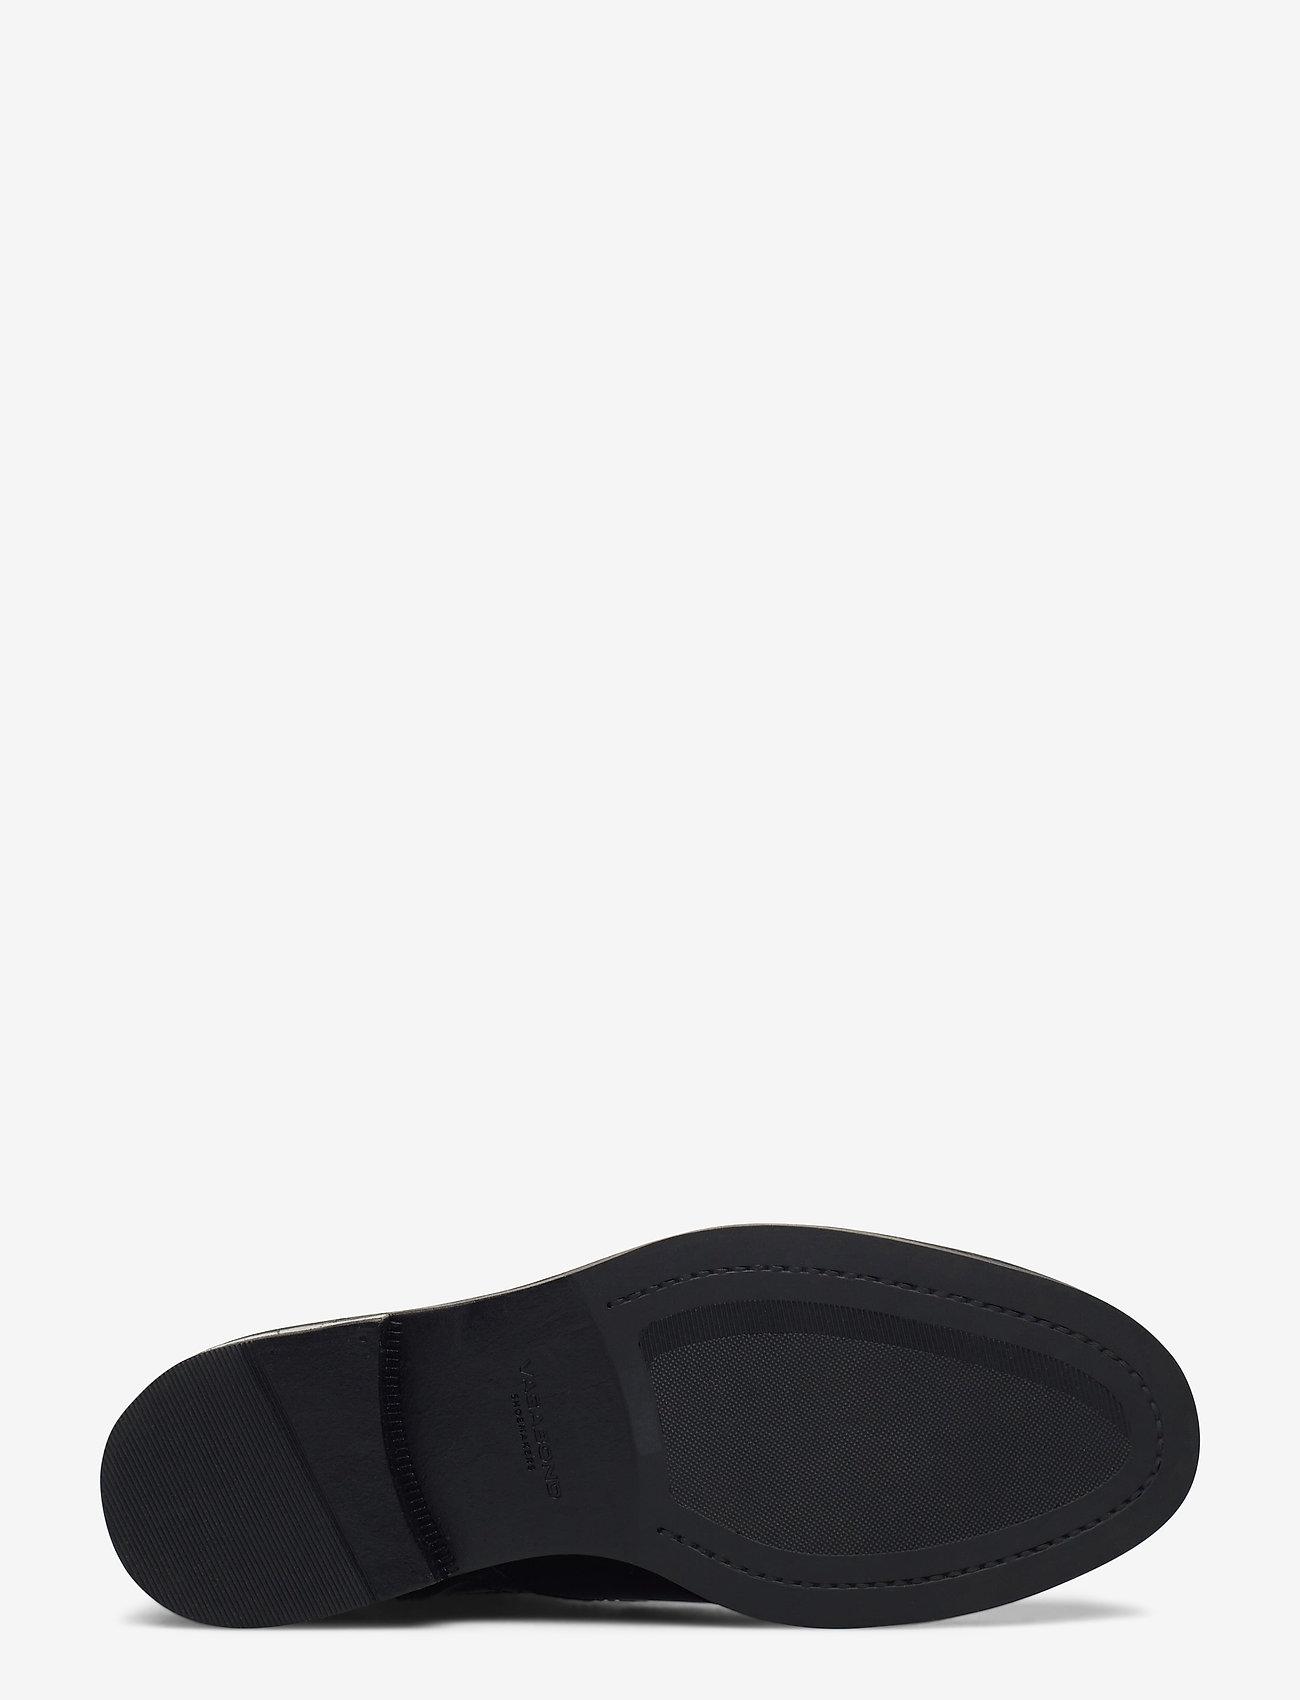 VAGABOND - AMINA - chelsea boots - black - 4